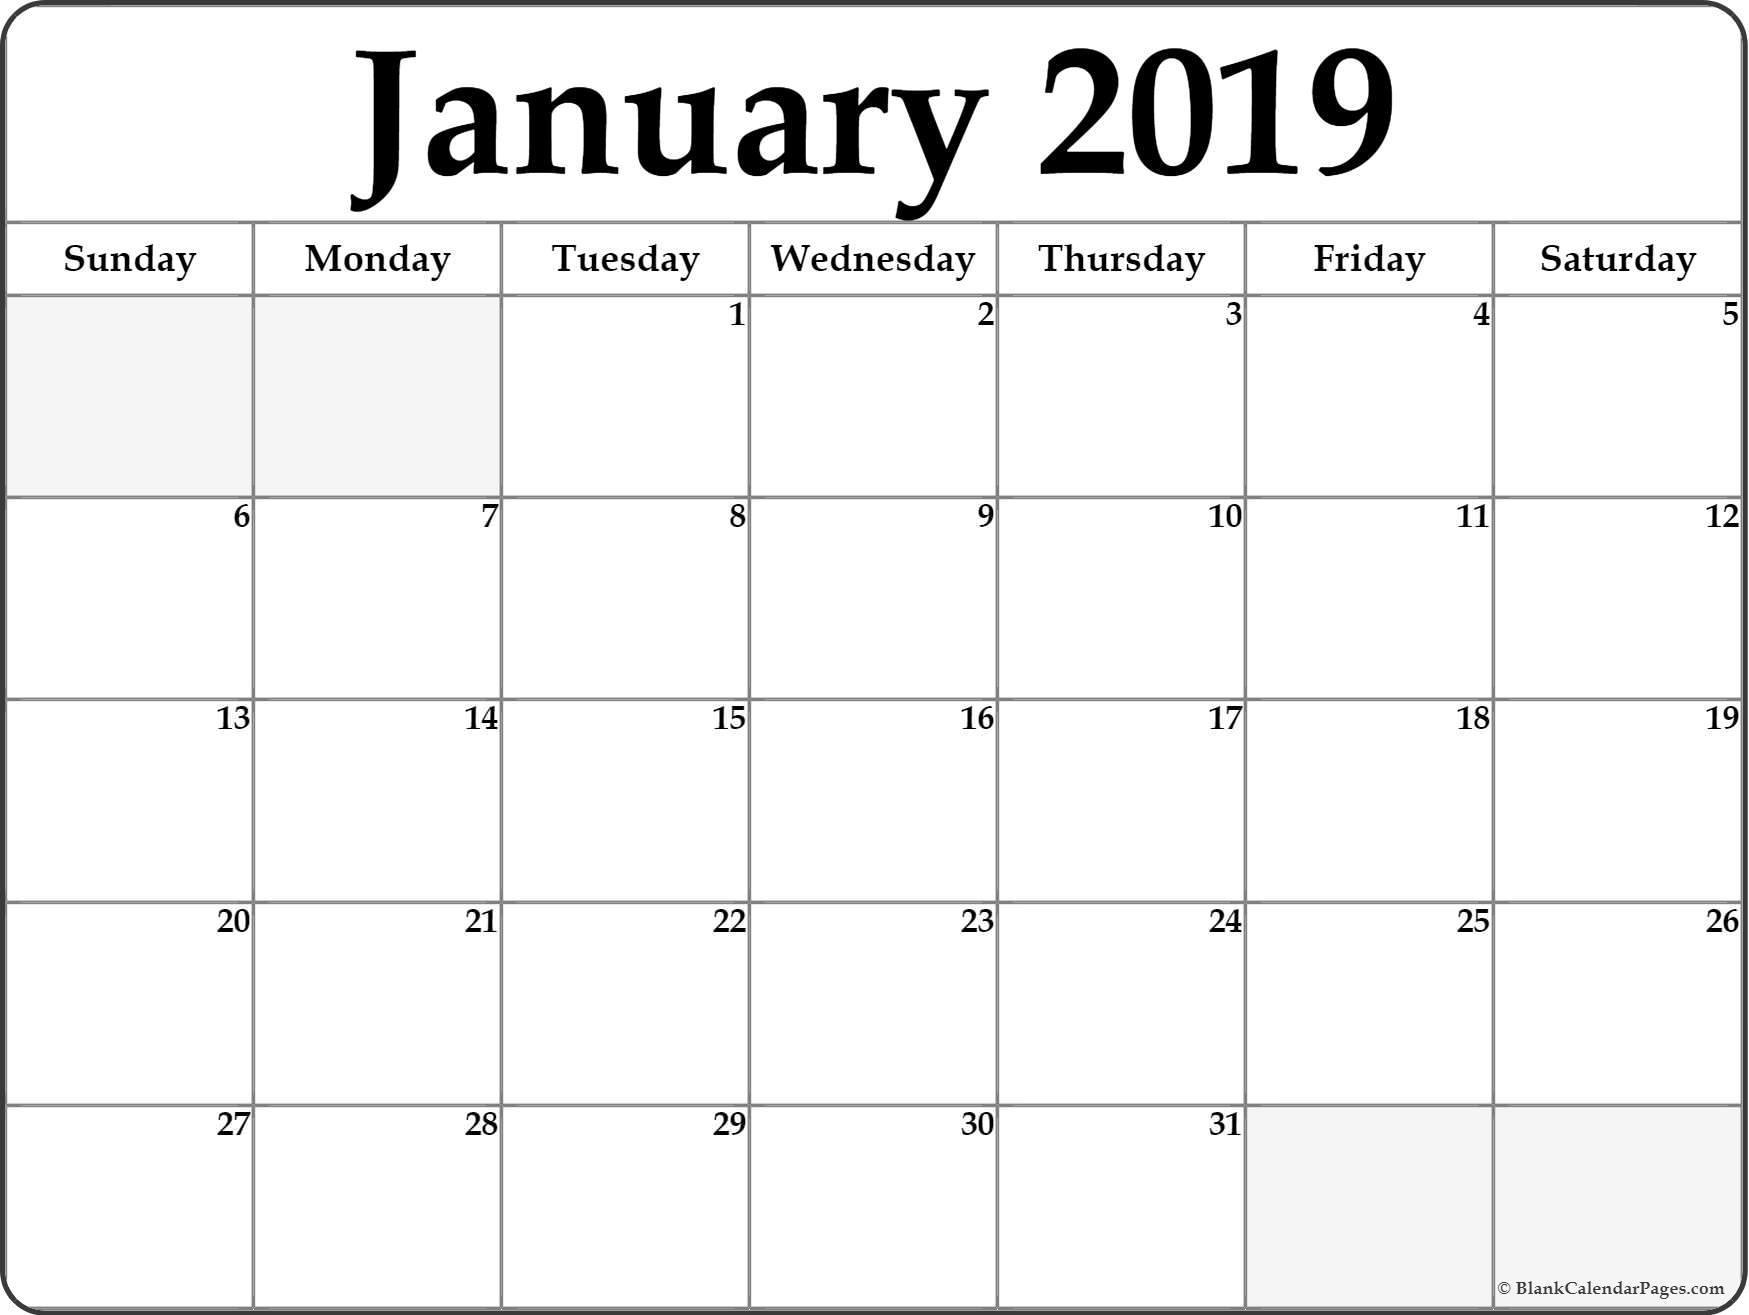 Monthly January 2019 Calendar Landscape